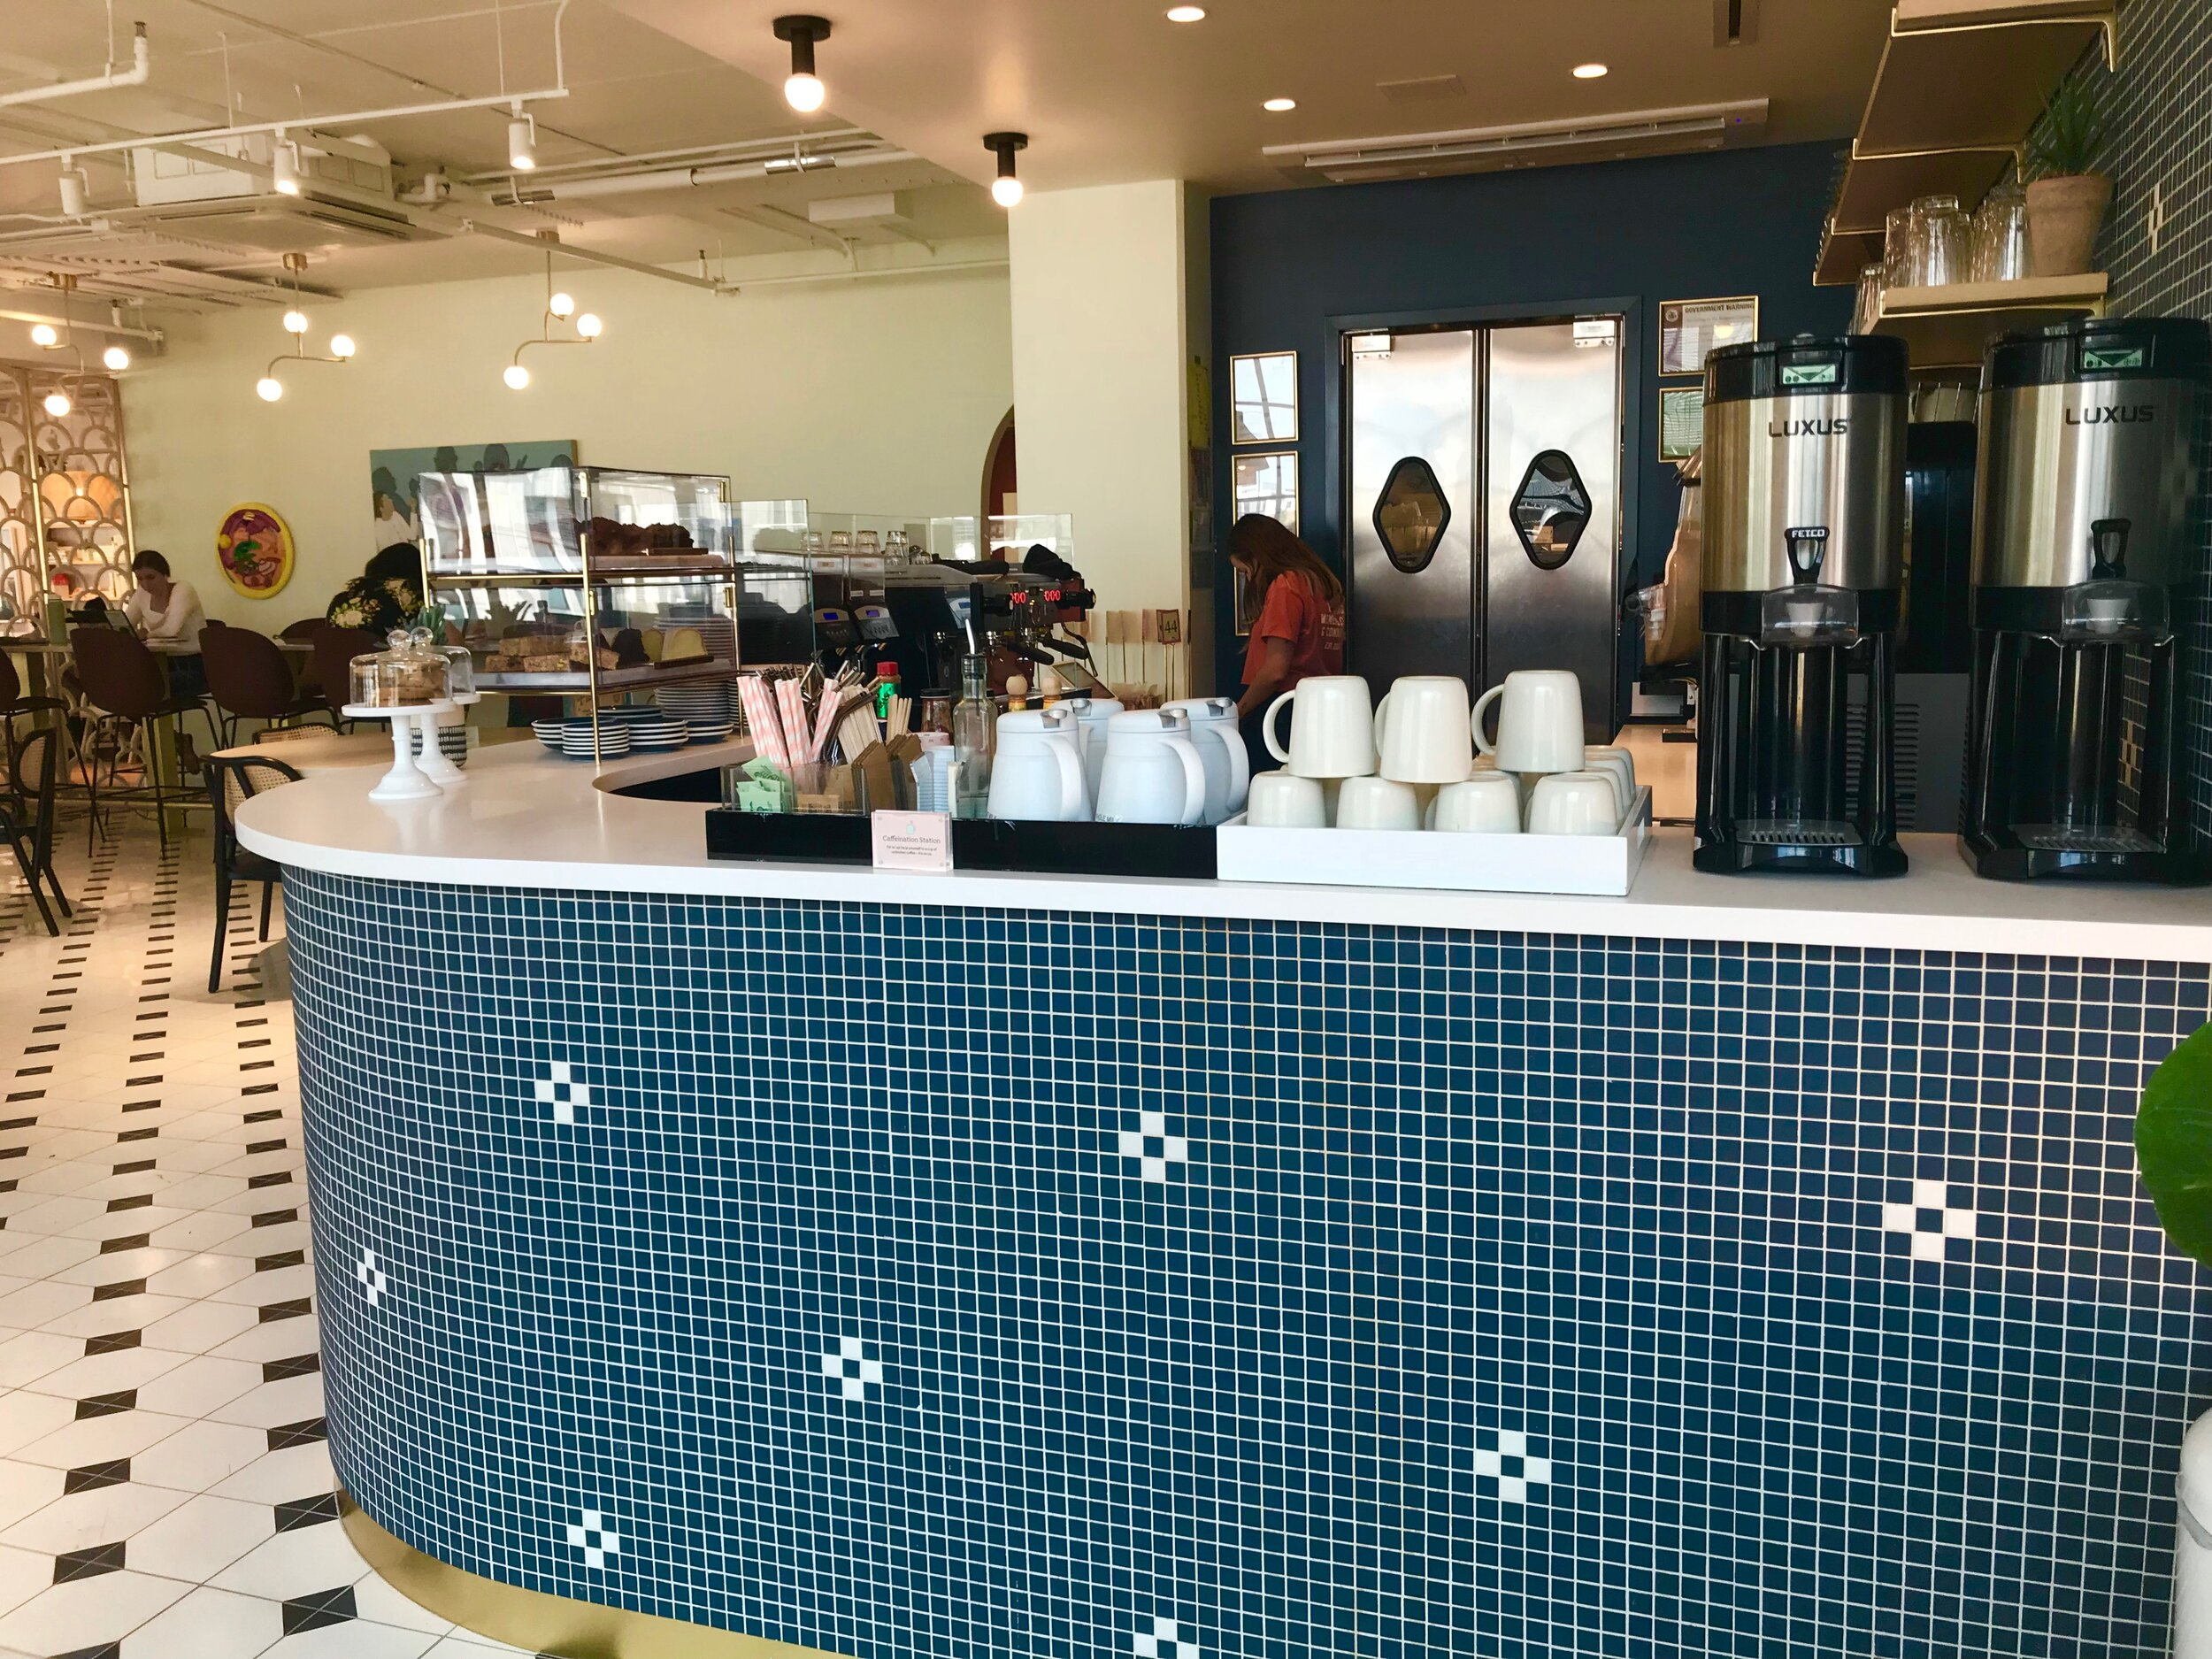 The Perch Coffee Bar